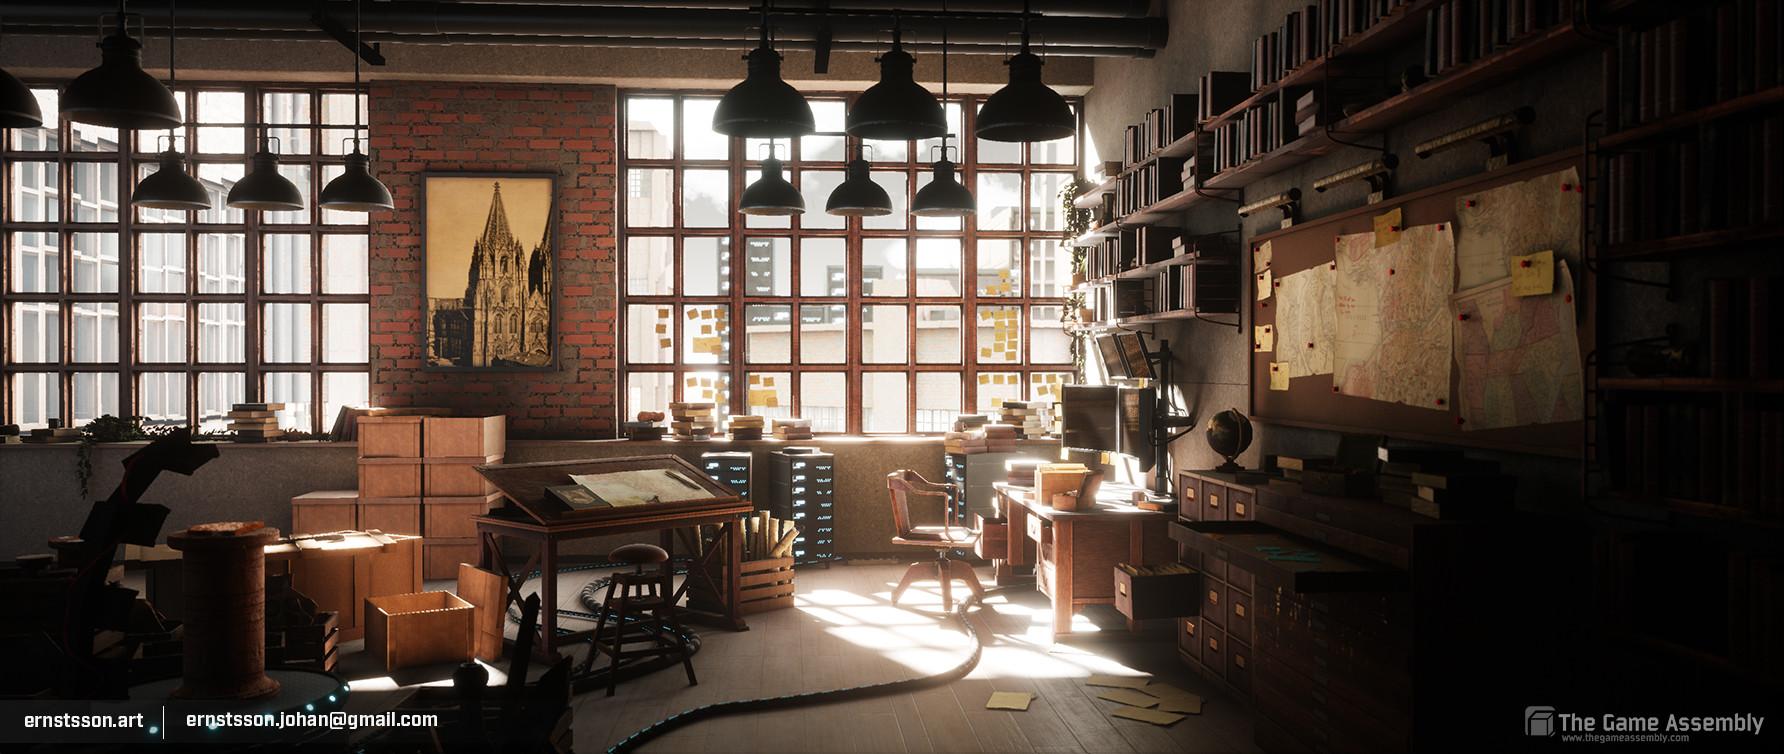 Johan ernstsson studio 1